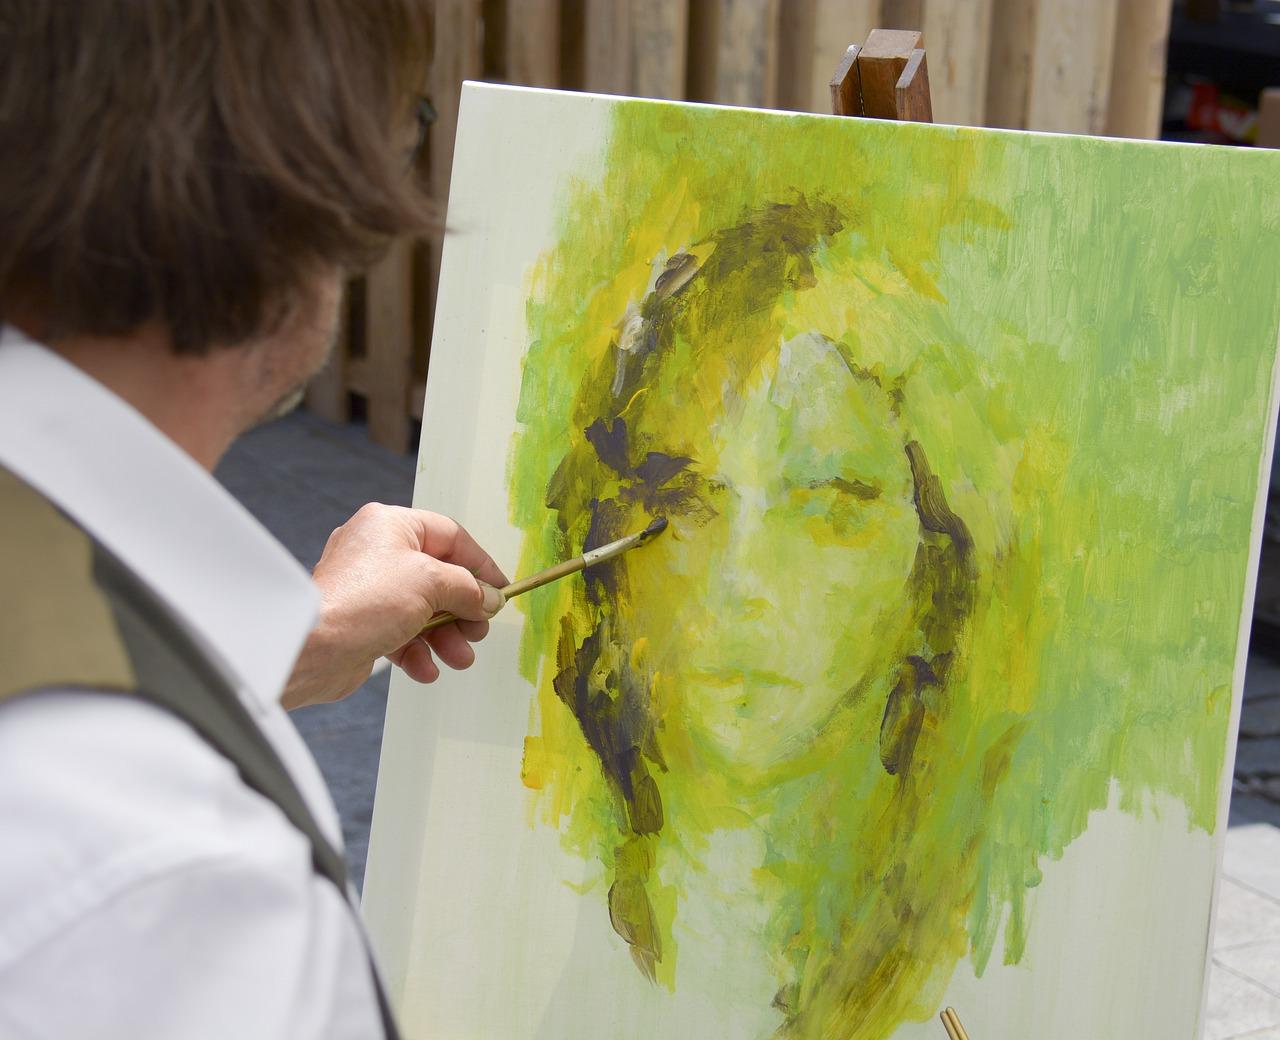 Disabili-Dipingere-e-una-Terapia-Efficace Disabili, dipingere è una terapia